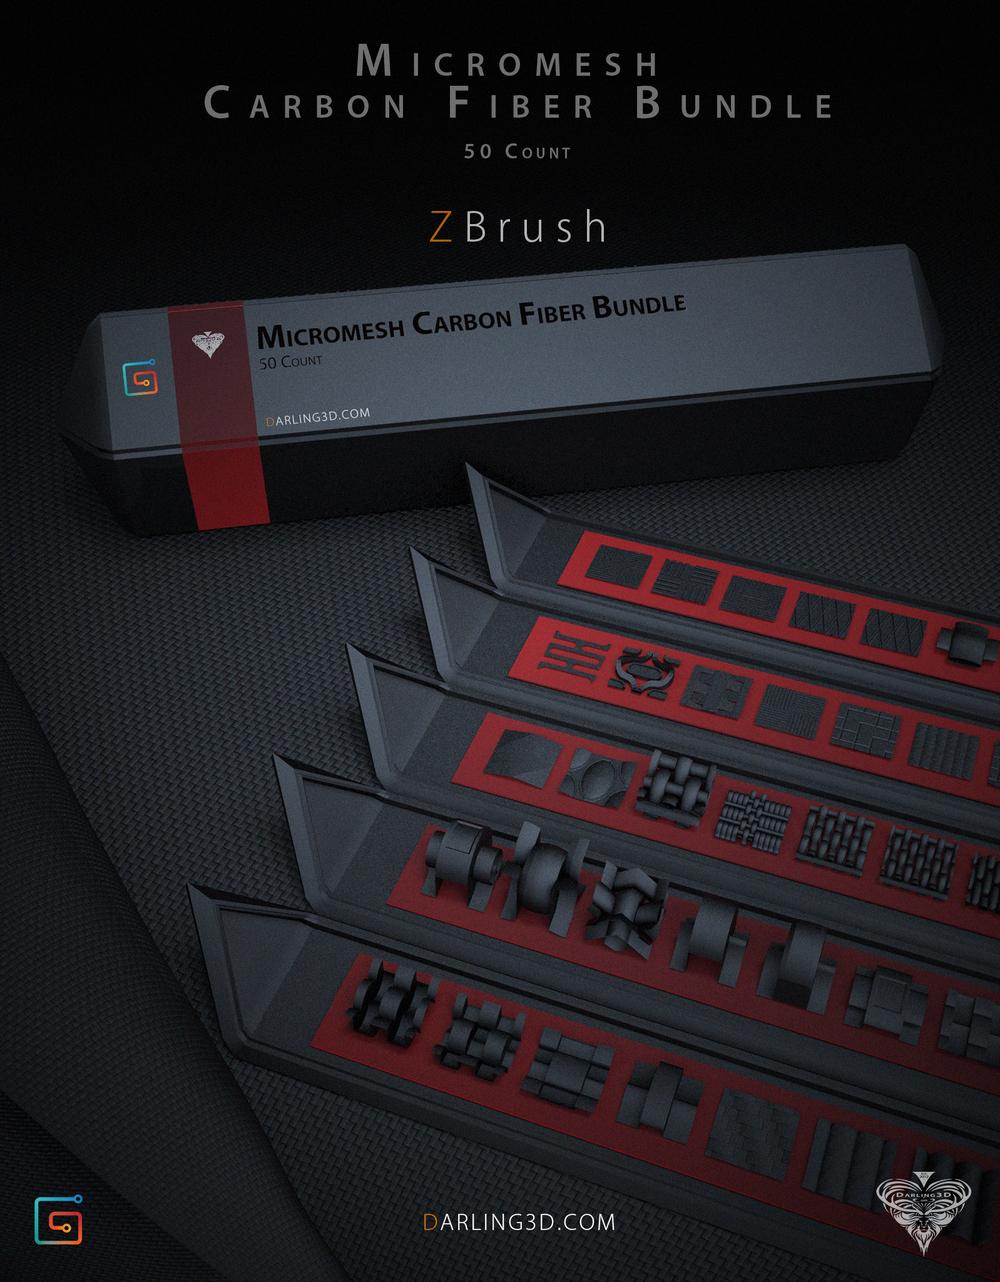 Carbon Fiber Micromesh